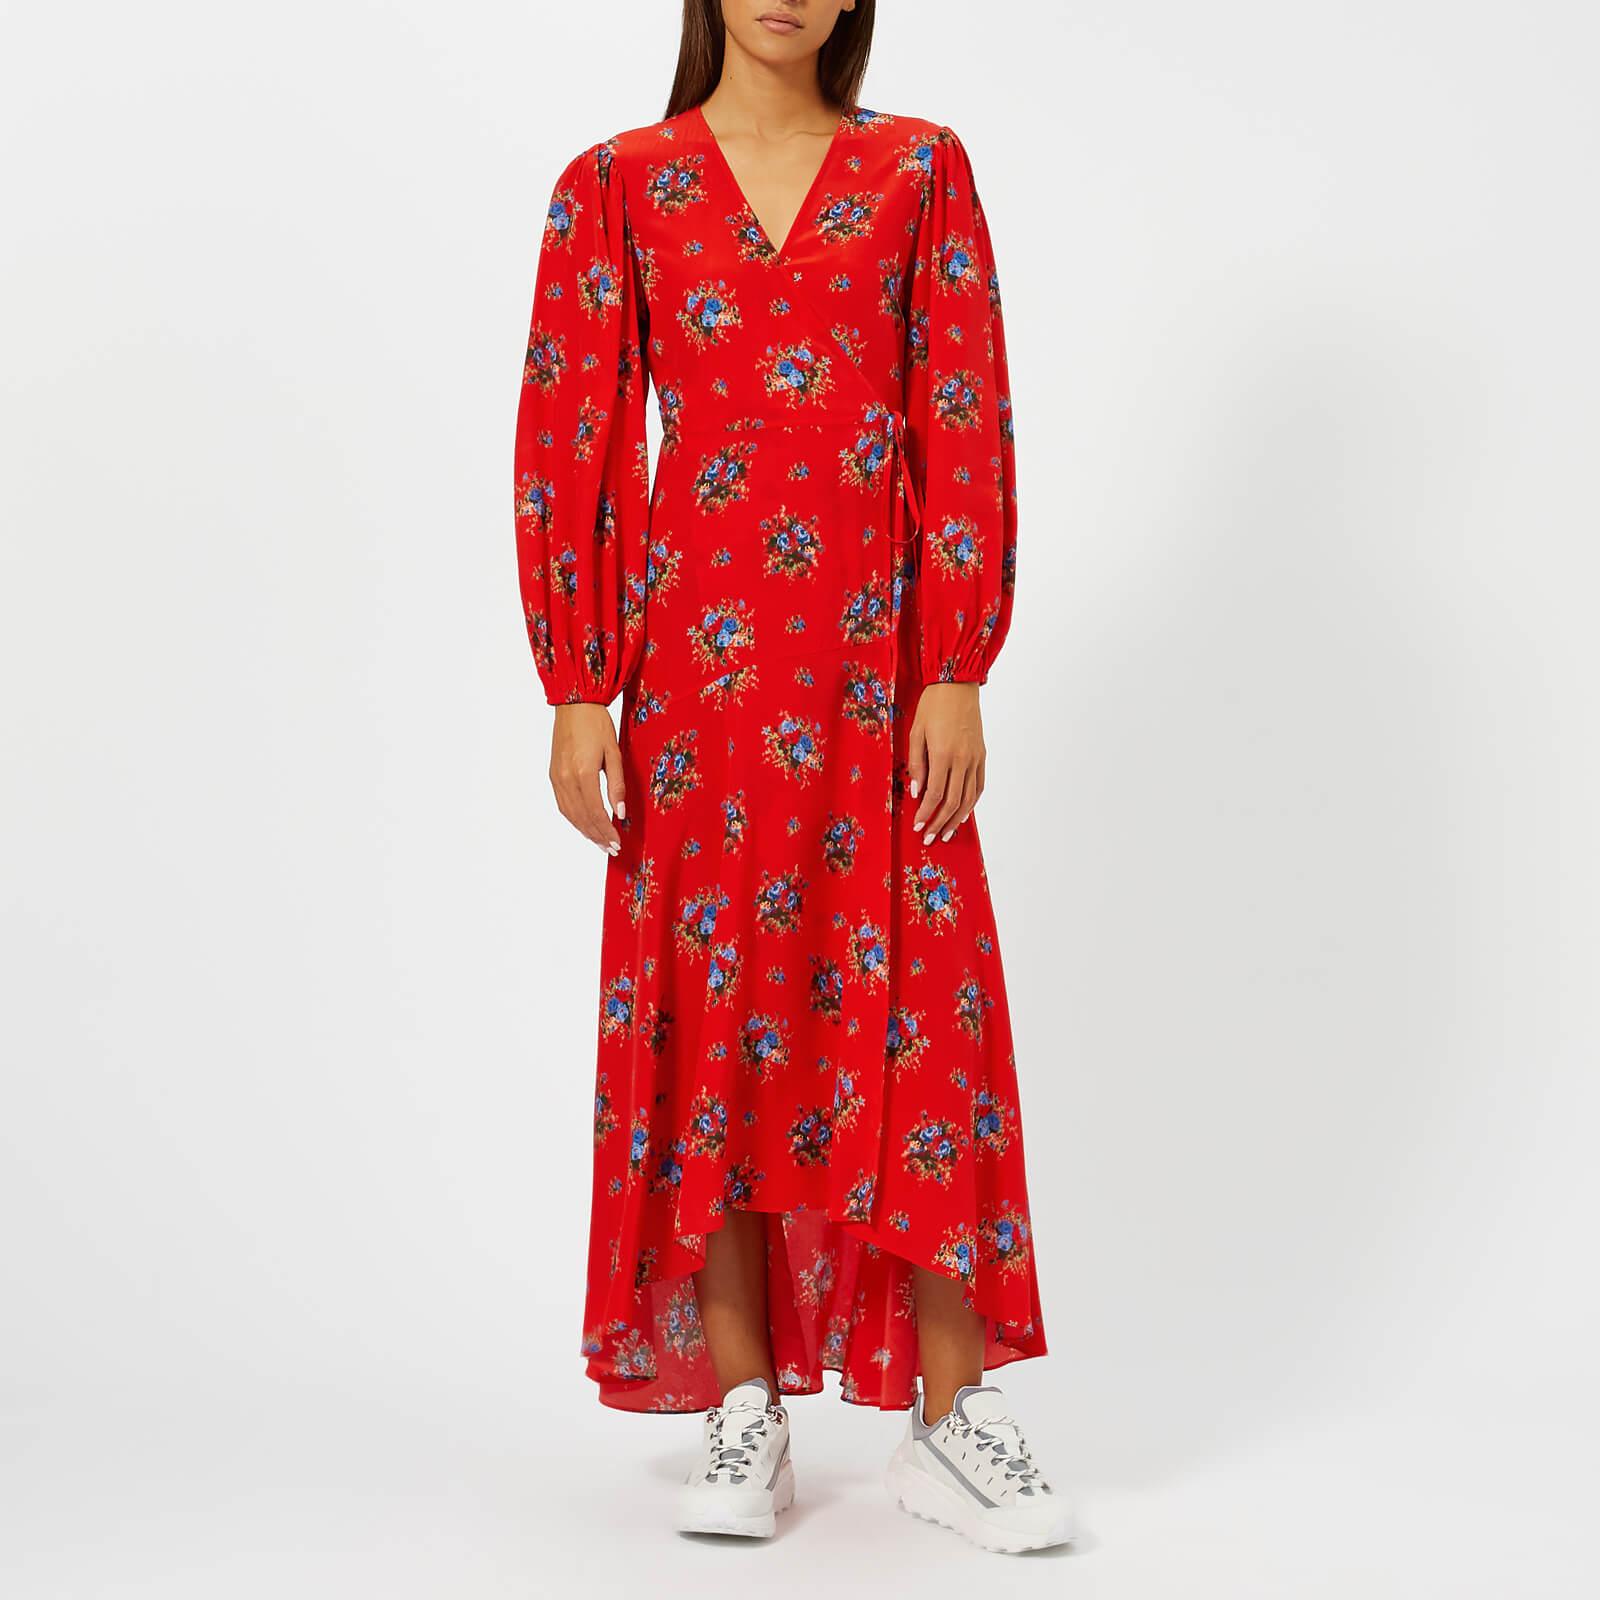 b5ac0e581c2 Ganni Women s Kochhar Print Long Dress - Fiery Red - Free UK ...